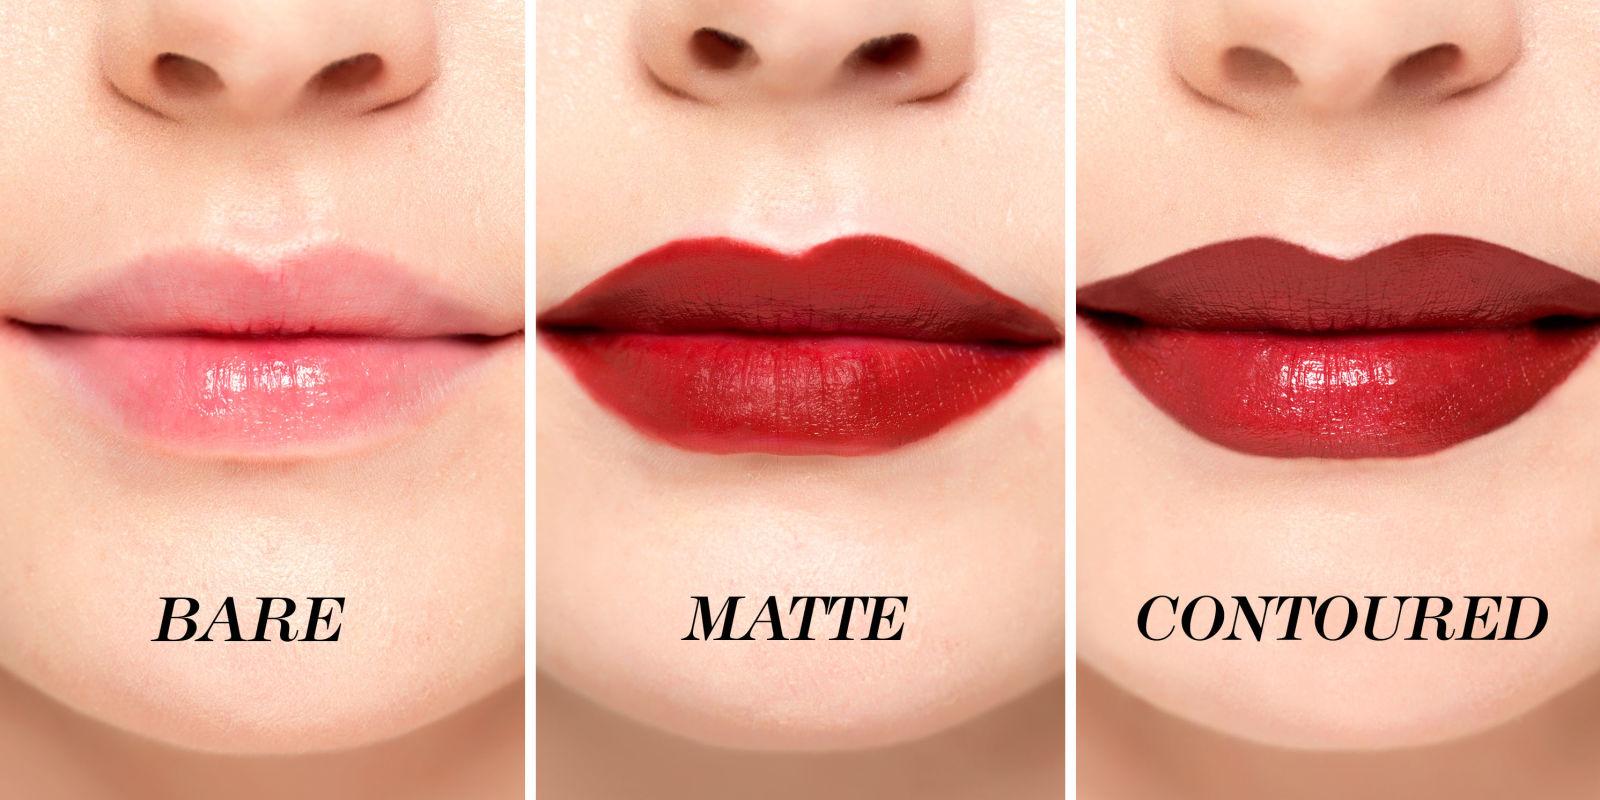 http://www.marieclaire.com/beauty/news/a14105/marilyn-monroe-lipstick-tutorial/